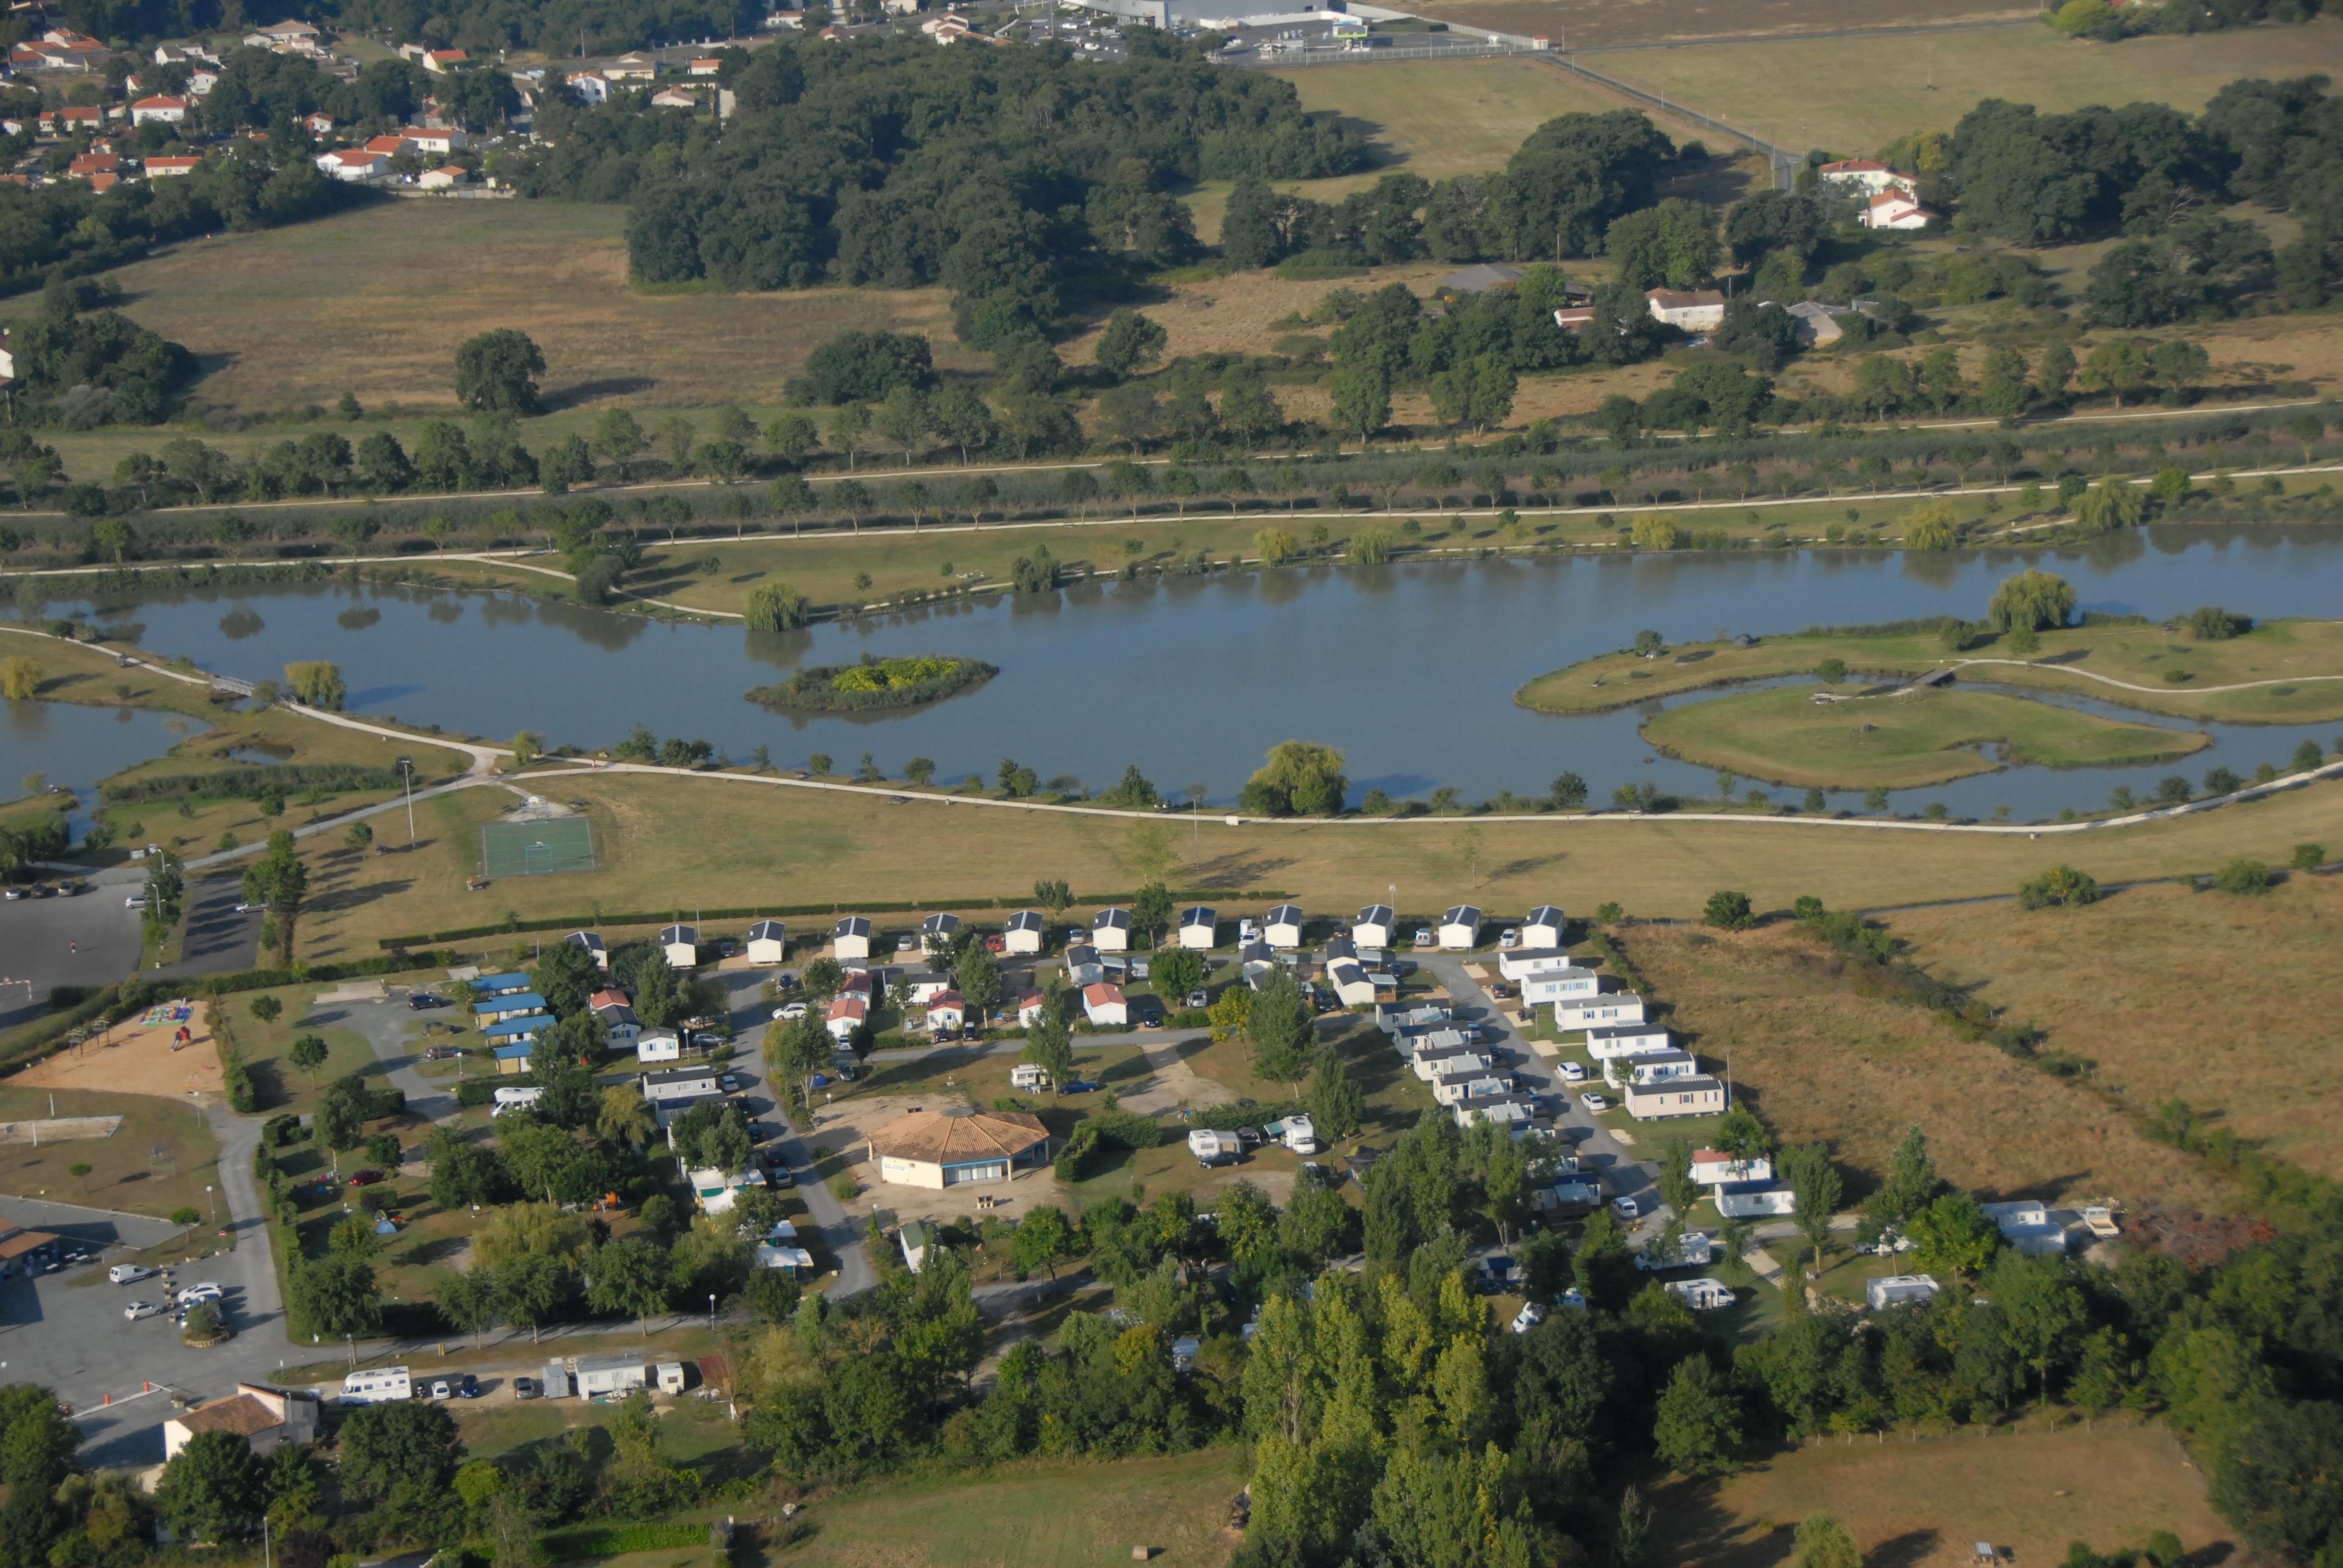 Camping du Lac, Saujon, Charente-Maritime